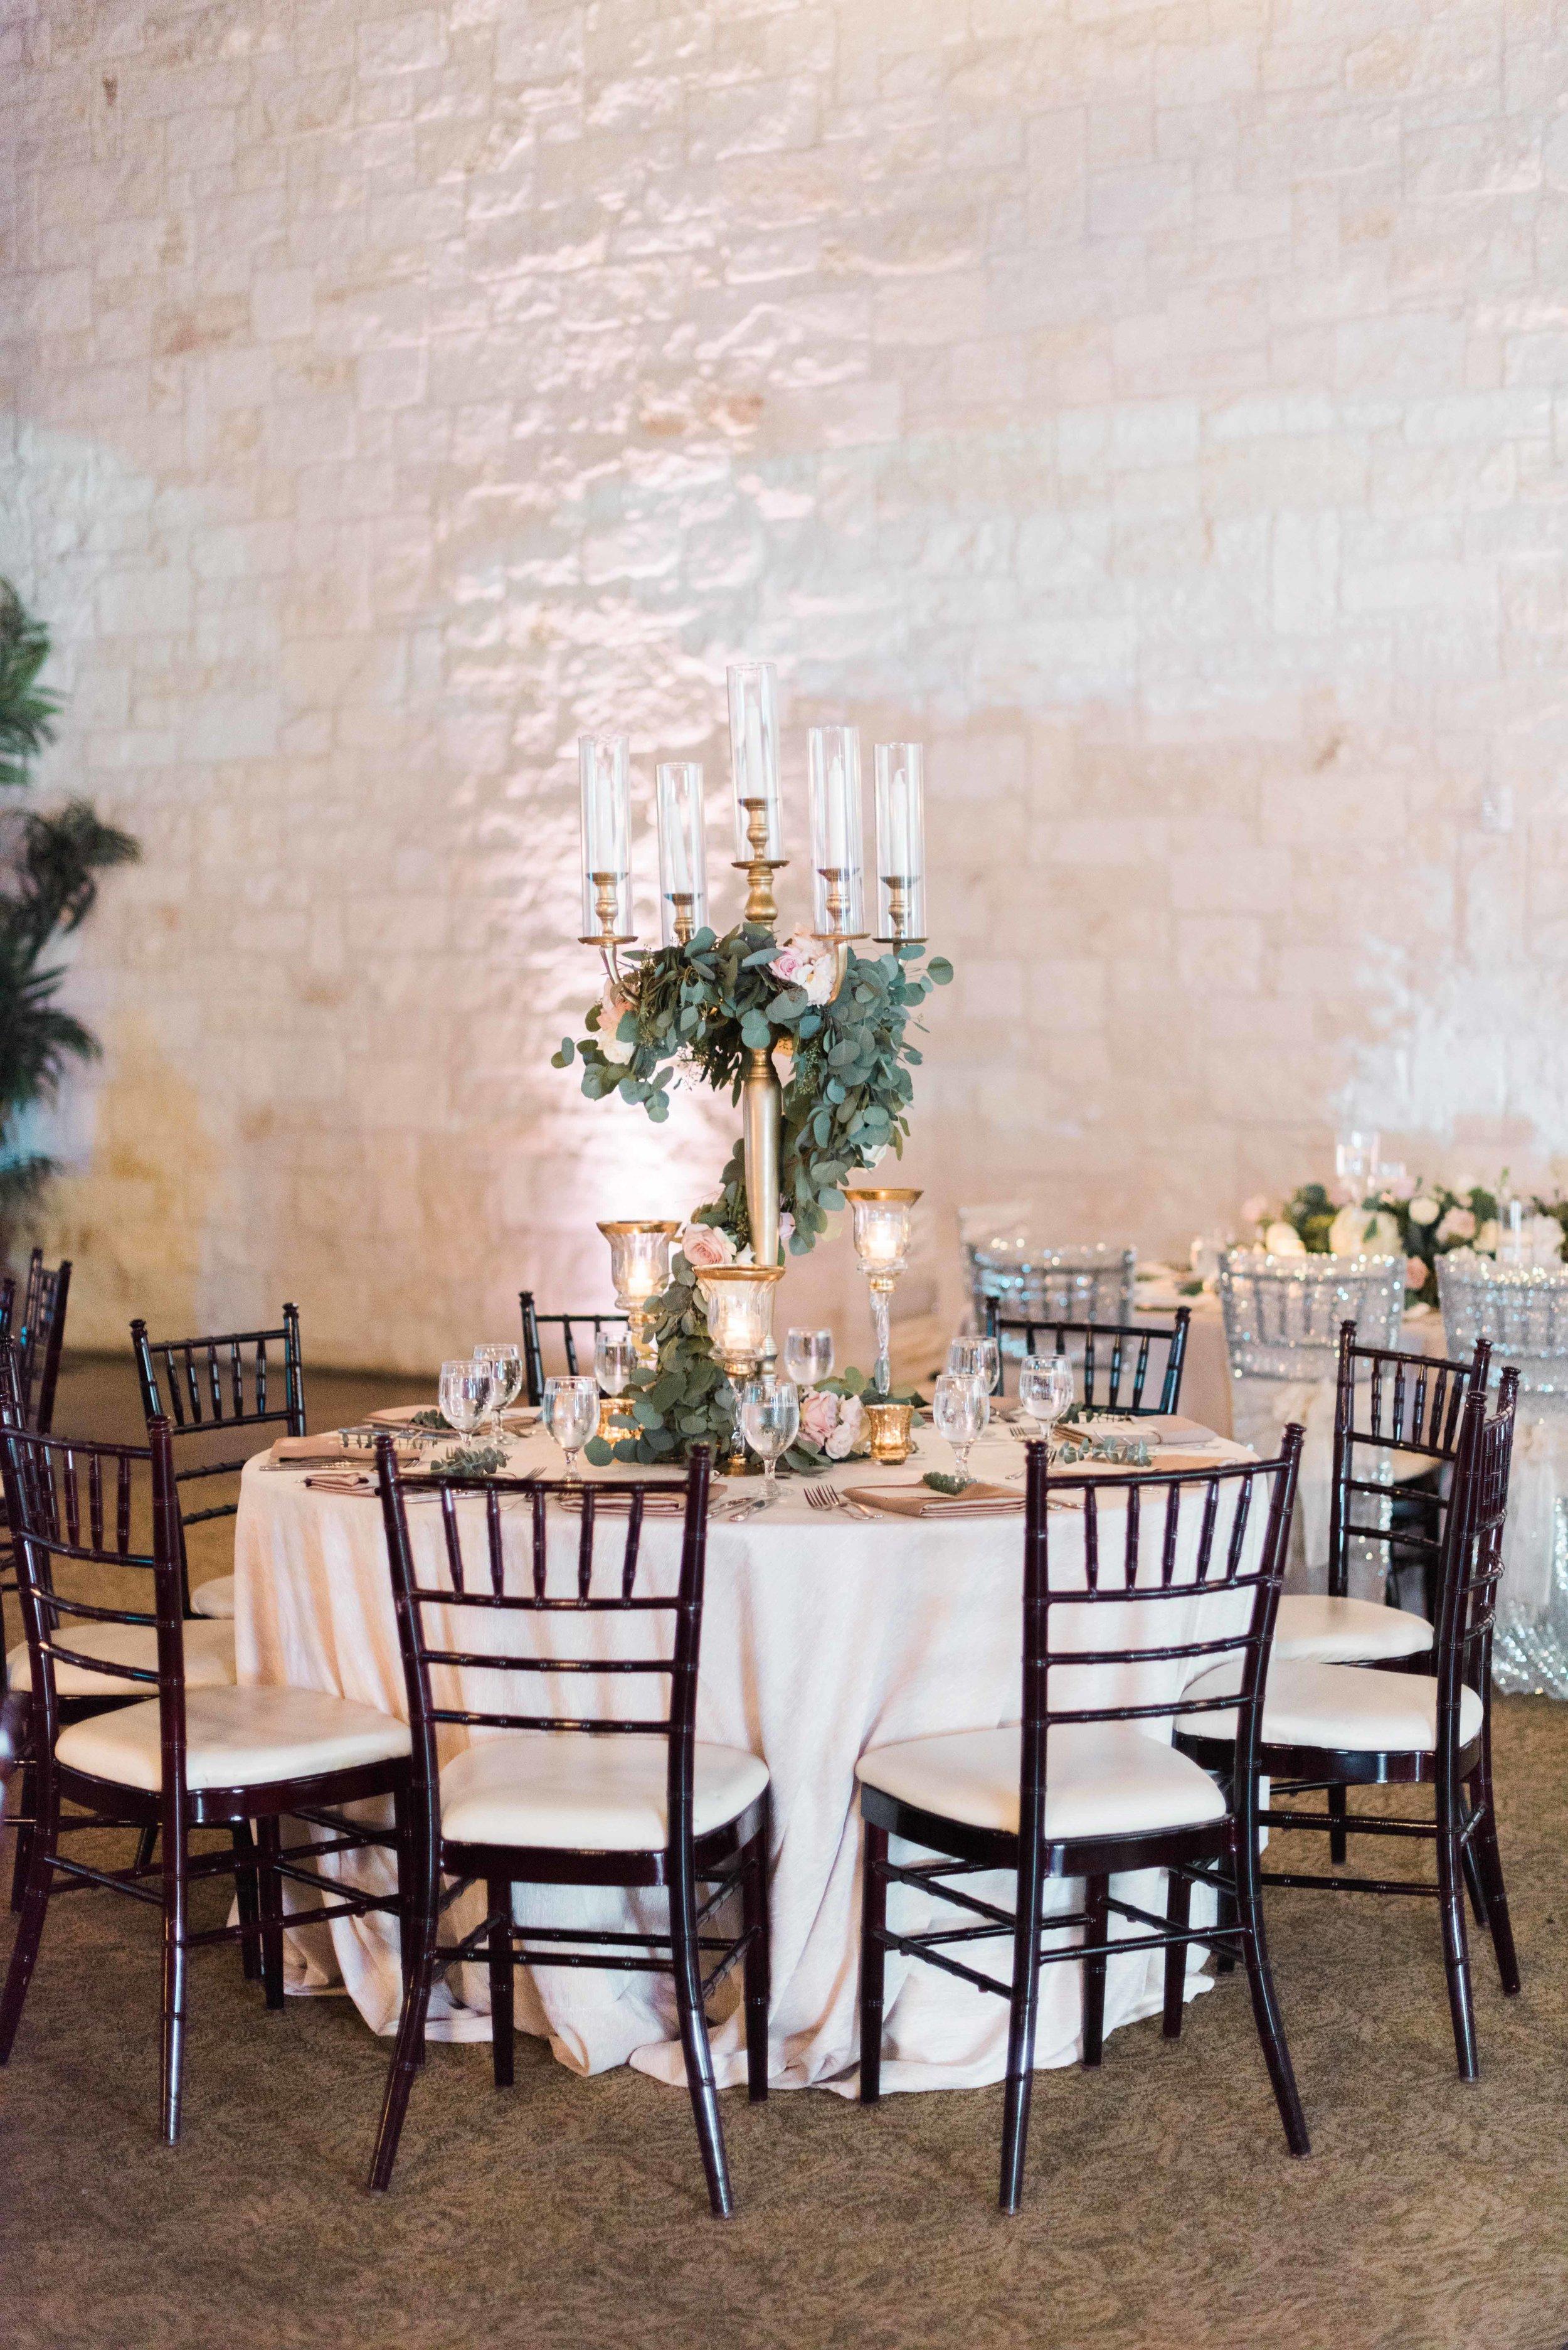 Briscoe-Manor-Houston-Wedding-Photographer-Modern-Luxury-Weddings-Dana-Fernandez-Photograpy-Fine-Art-Photographer-Houston-Film-Destination-PNW-Wedding-Photographer-14.jpg